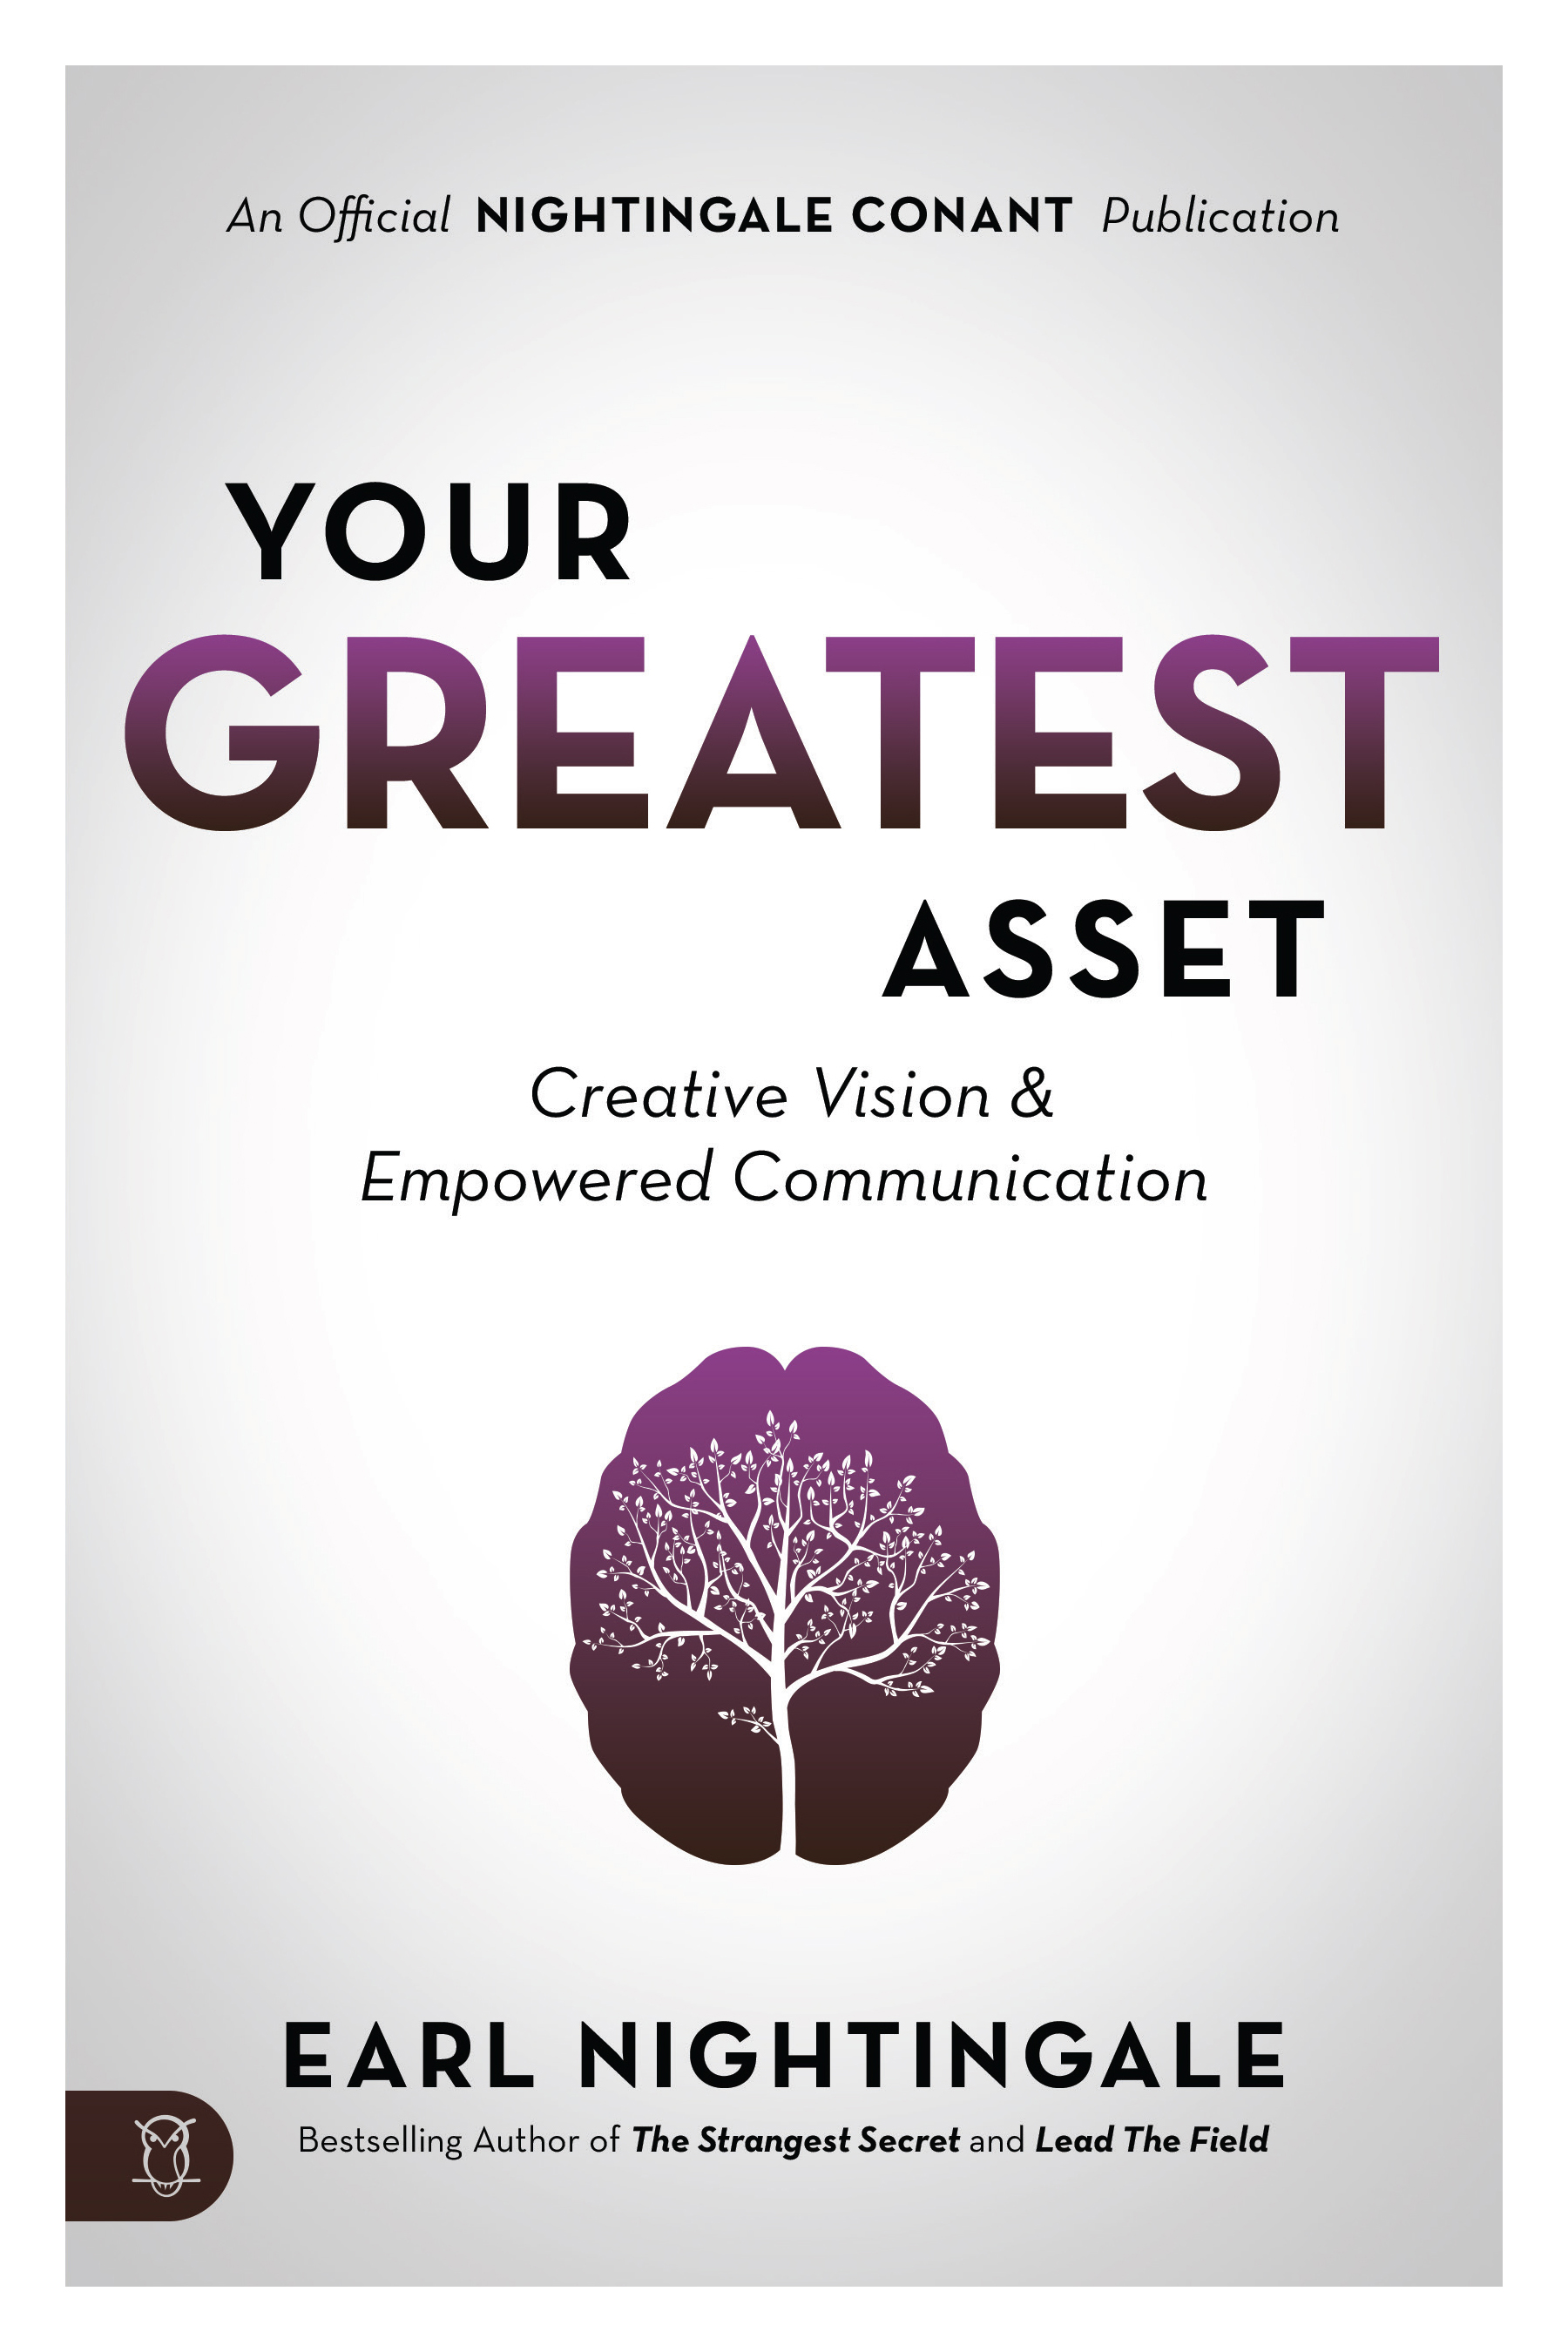 Your_Greatest_Asset.jpg